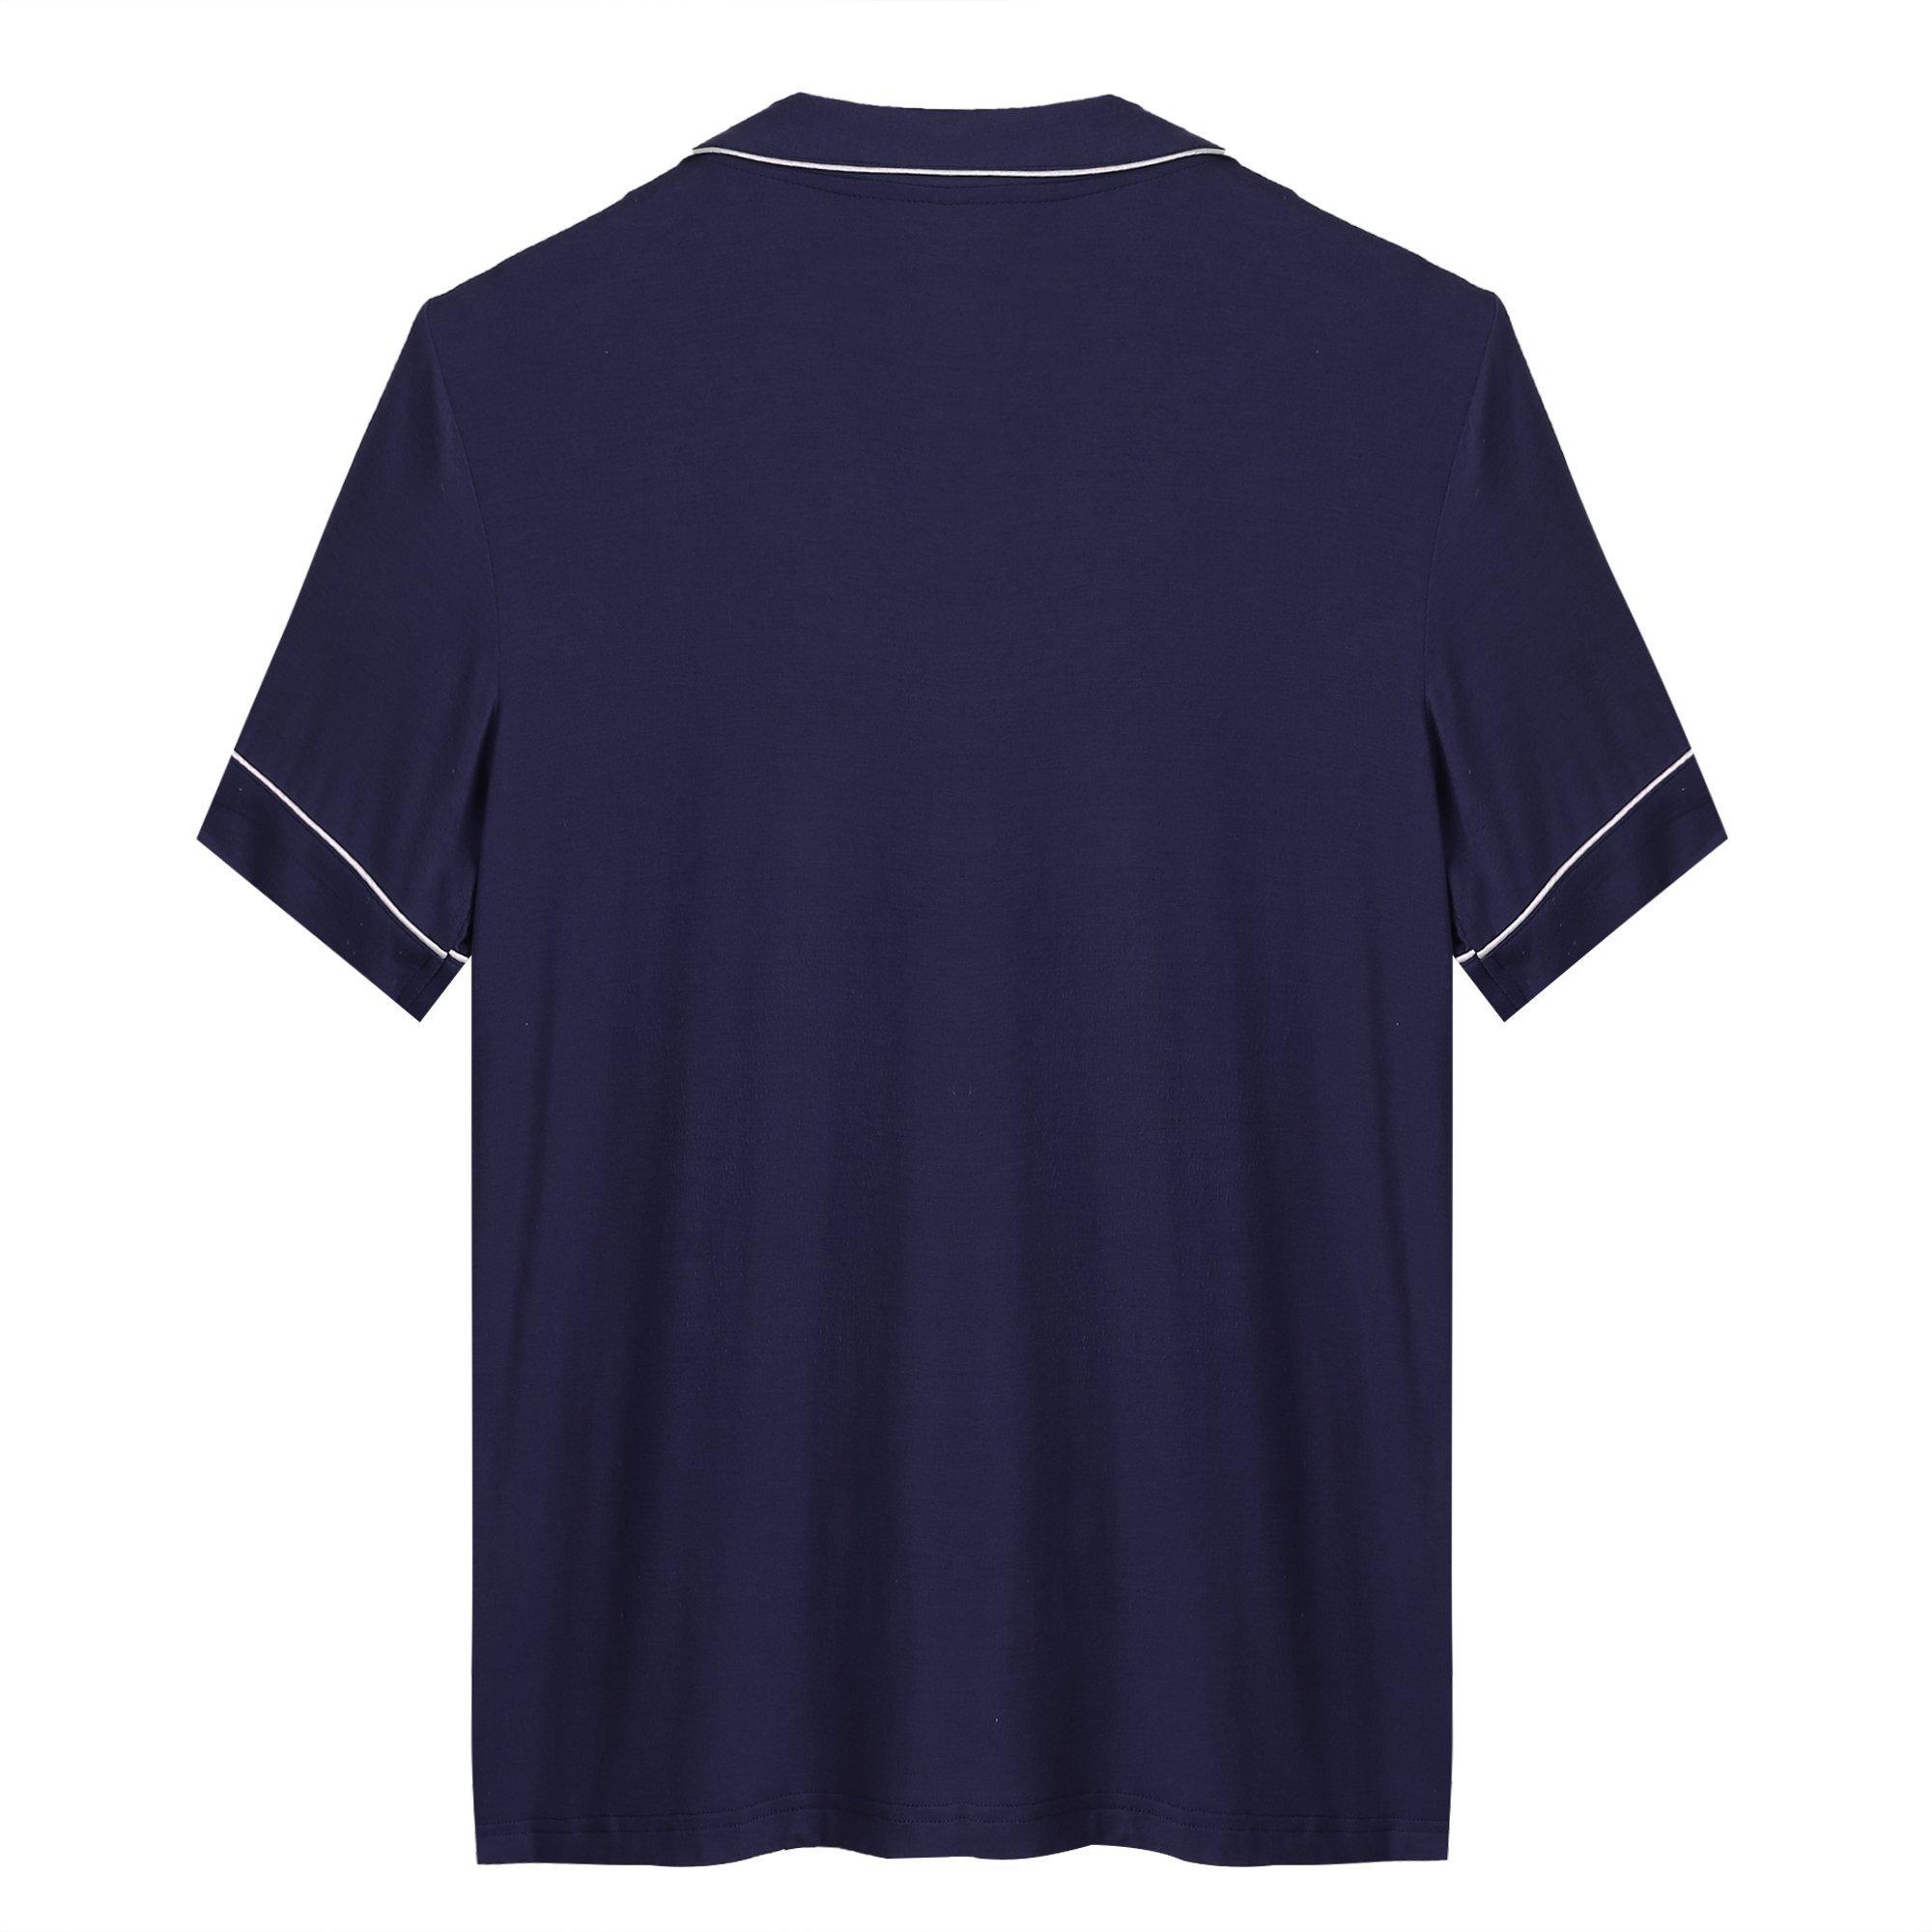 Womens Pajamas Short Sets AMP005 Navyblue M by Seaside (Image #5)